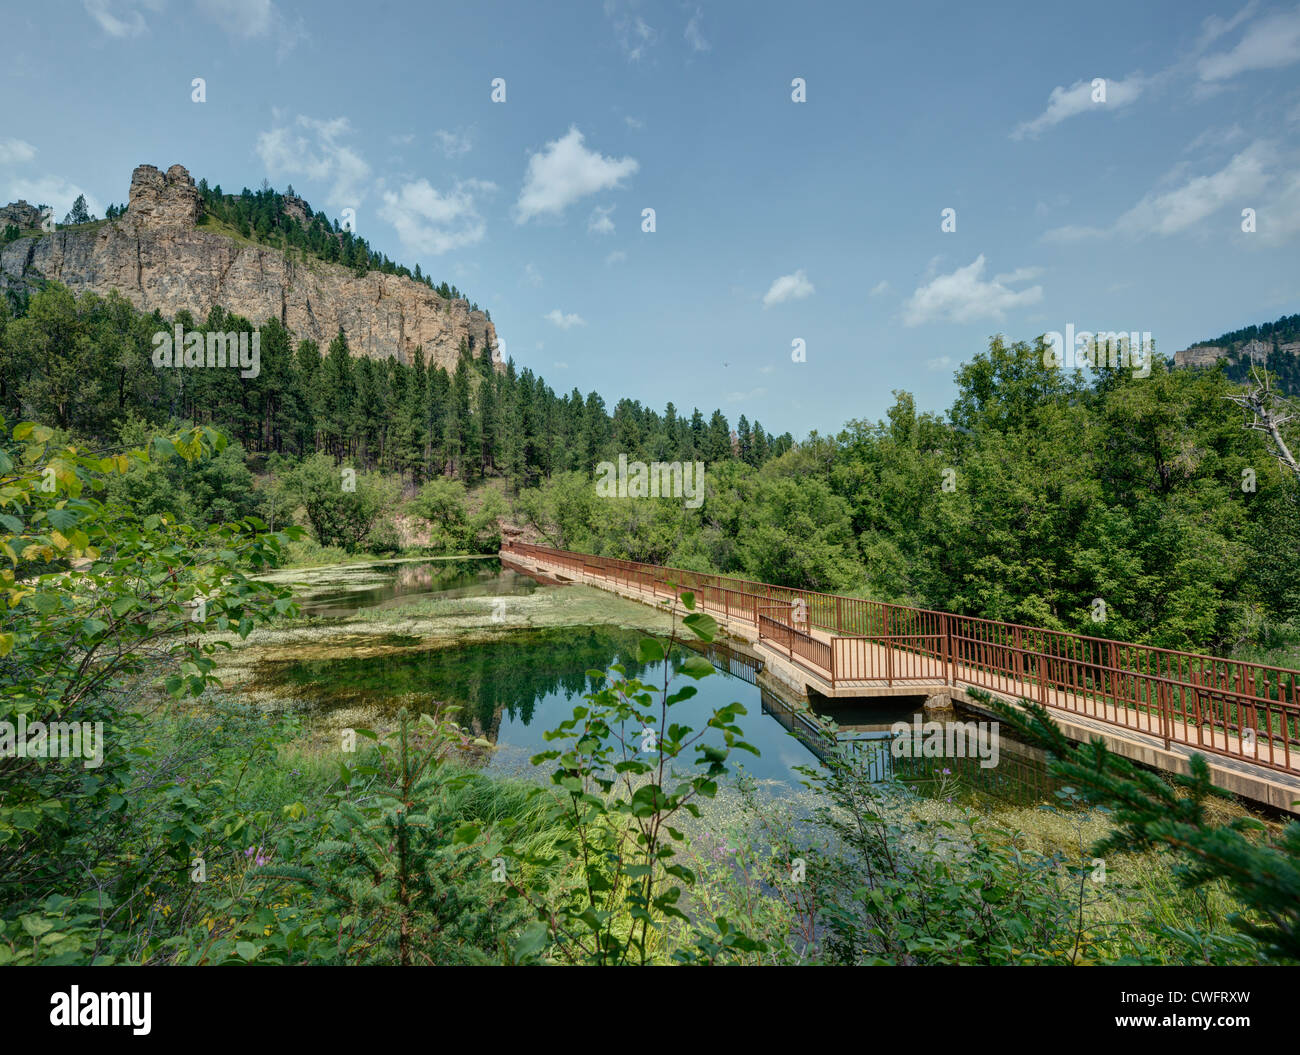 Black Hills in South Dakota in the Summer. - Stock Image